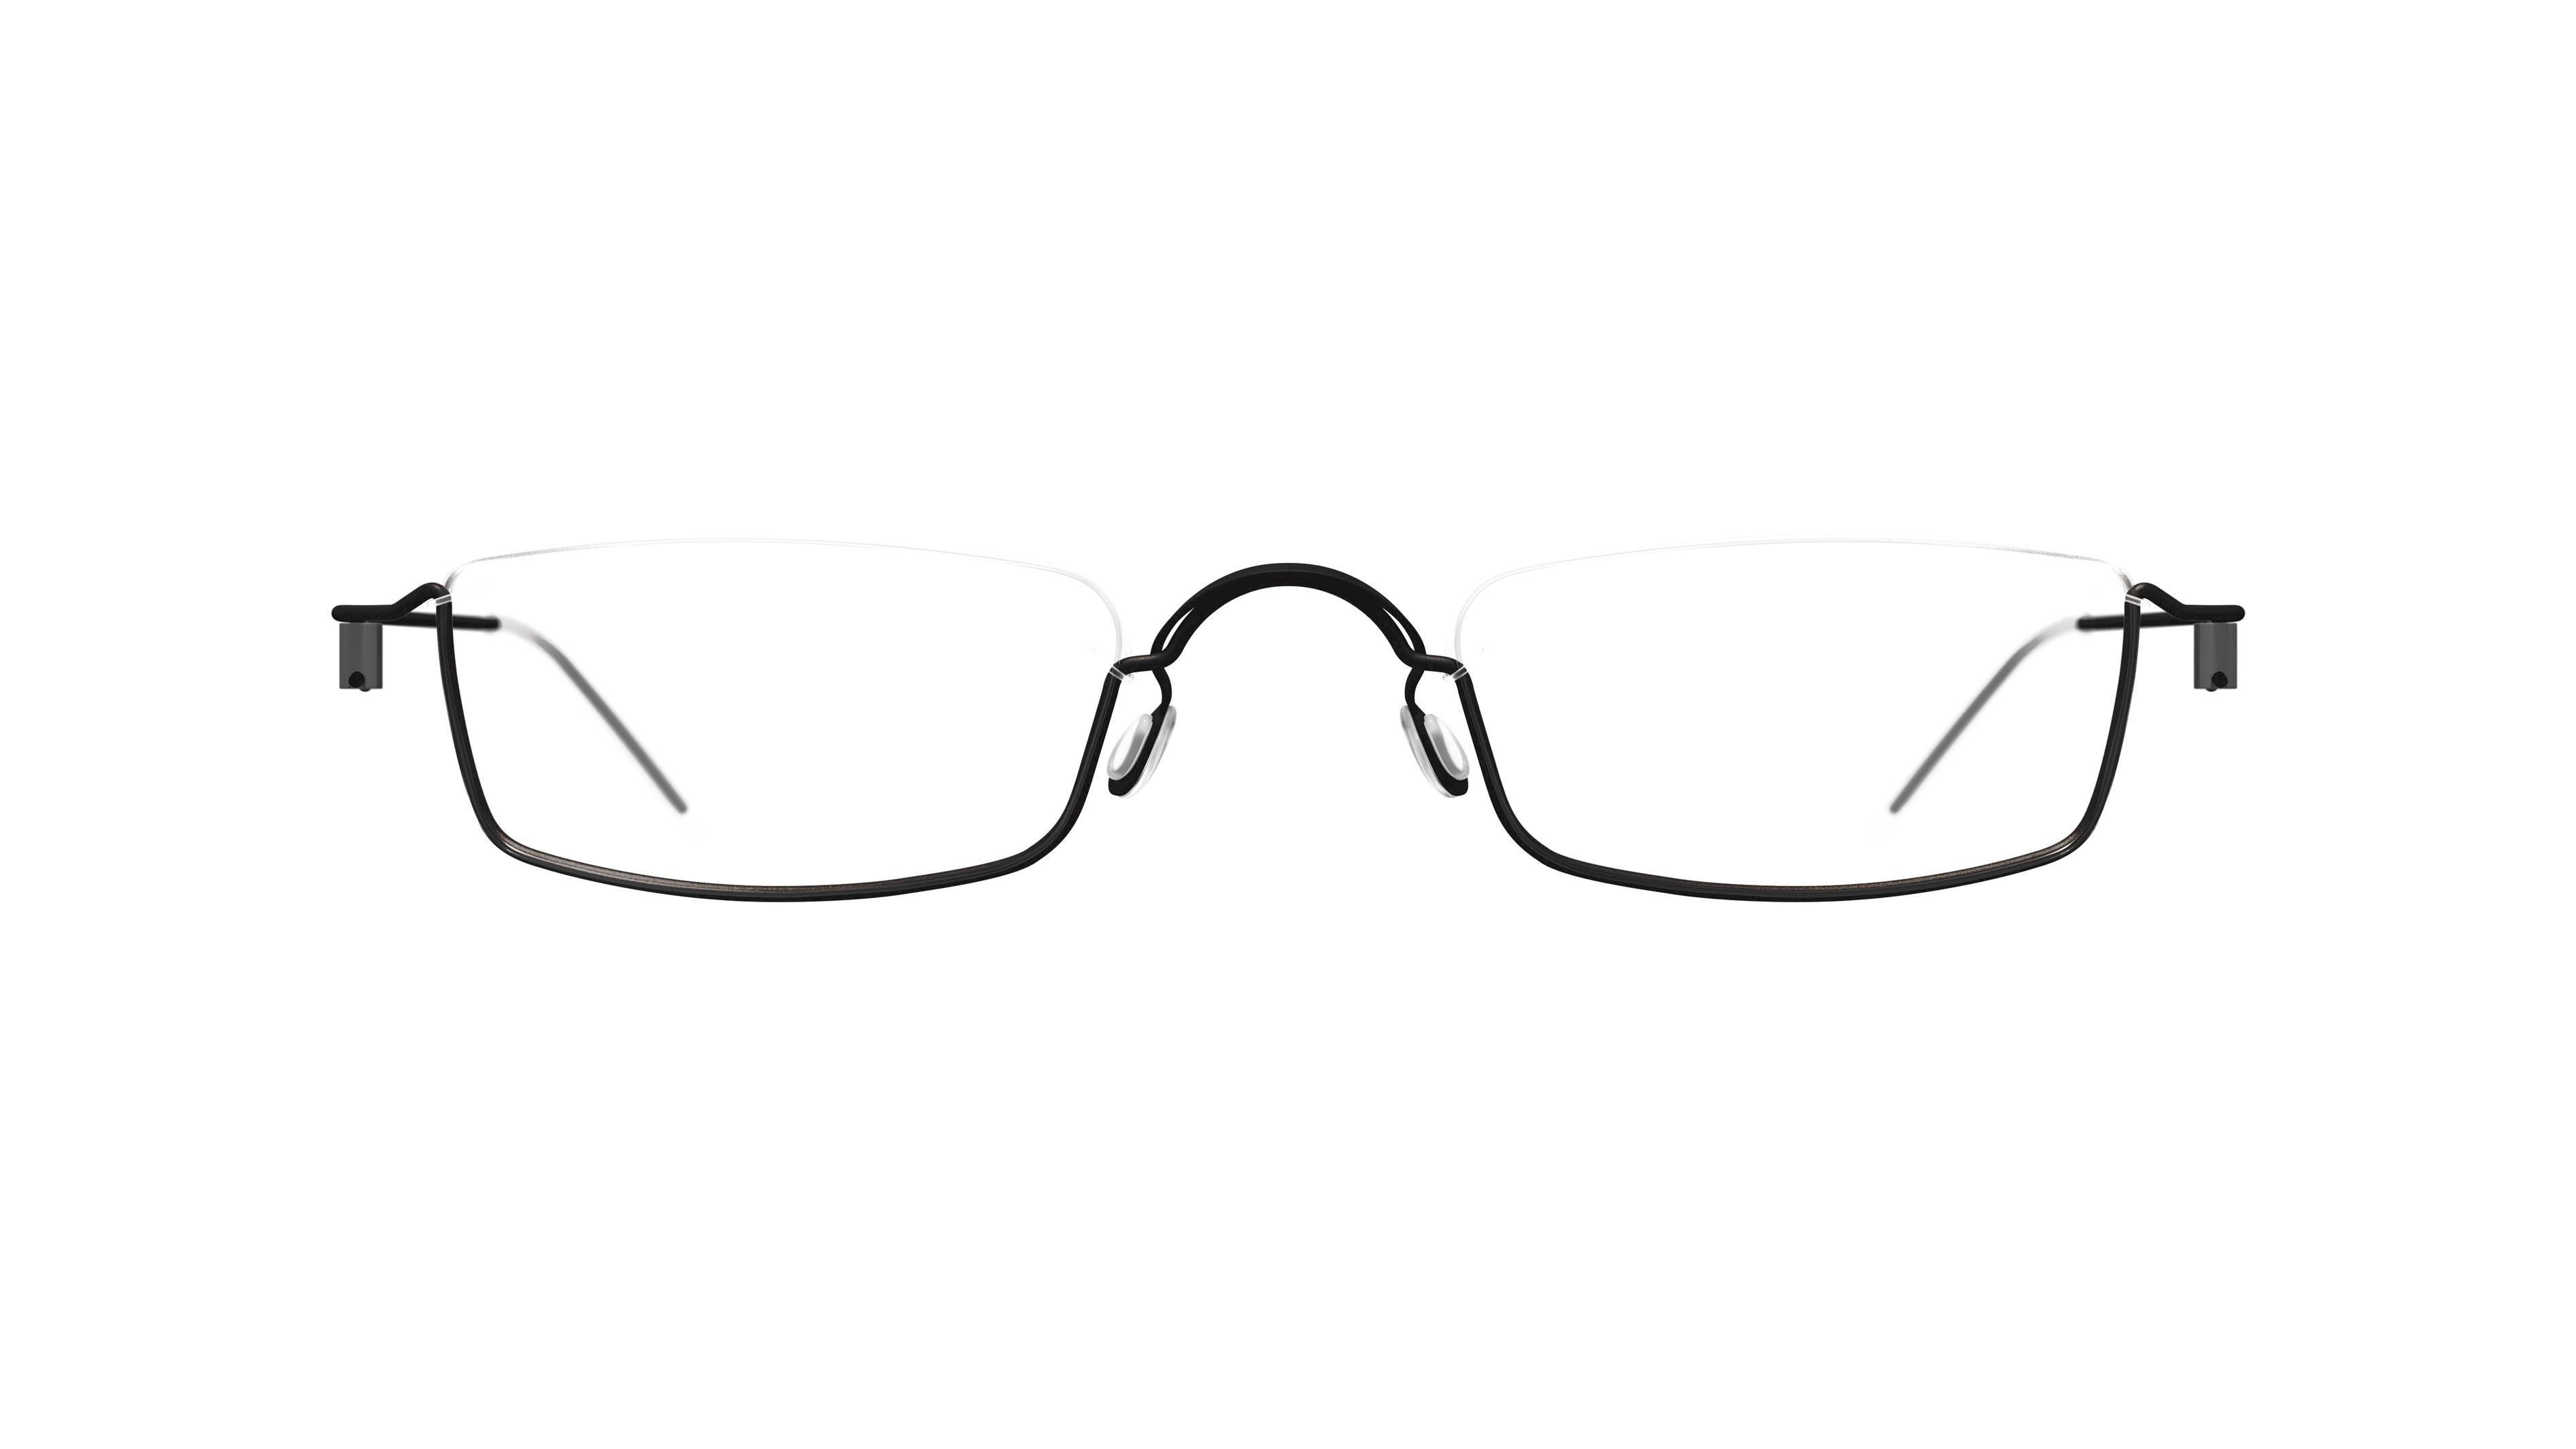 MARKUS T | frame: DESIGN Classic D2-067-130-130-001